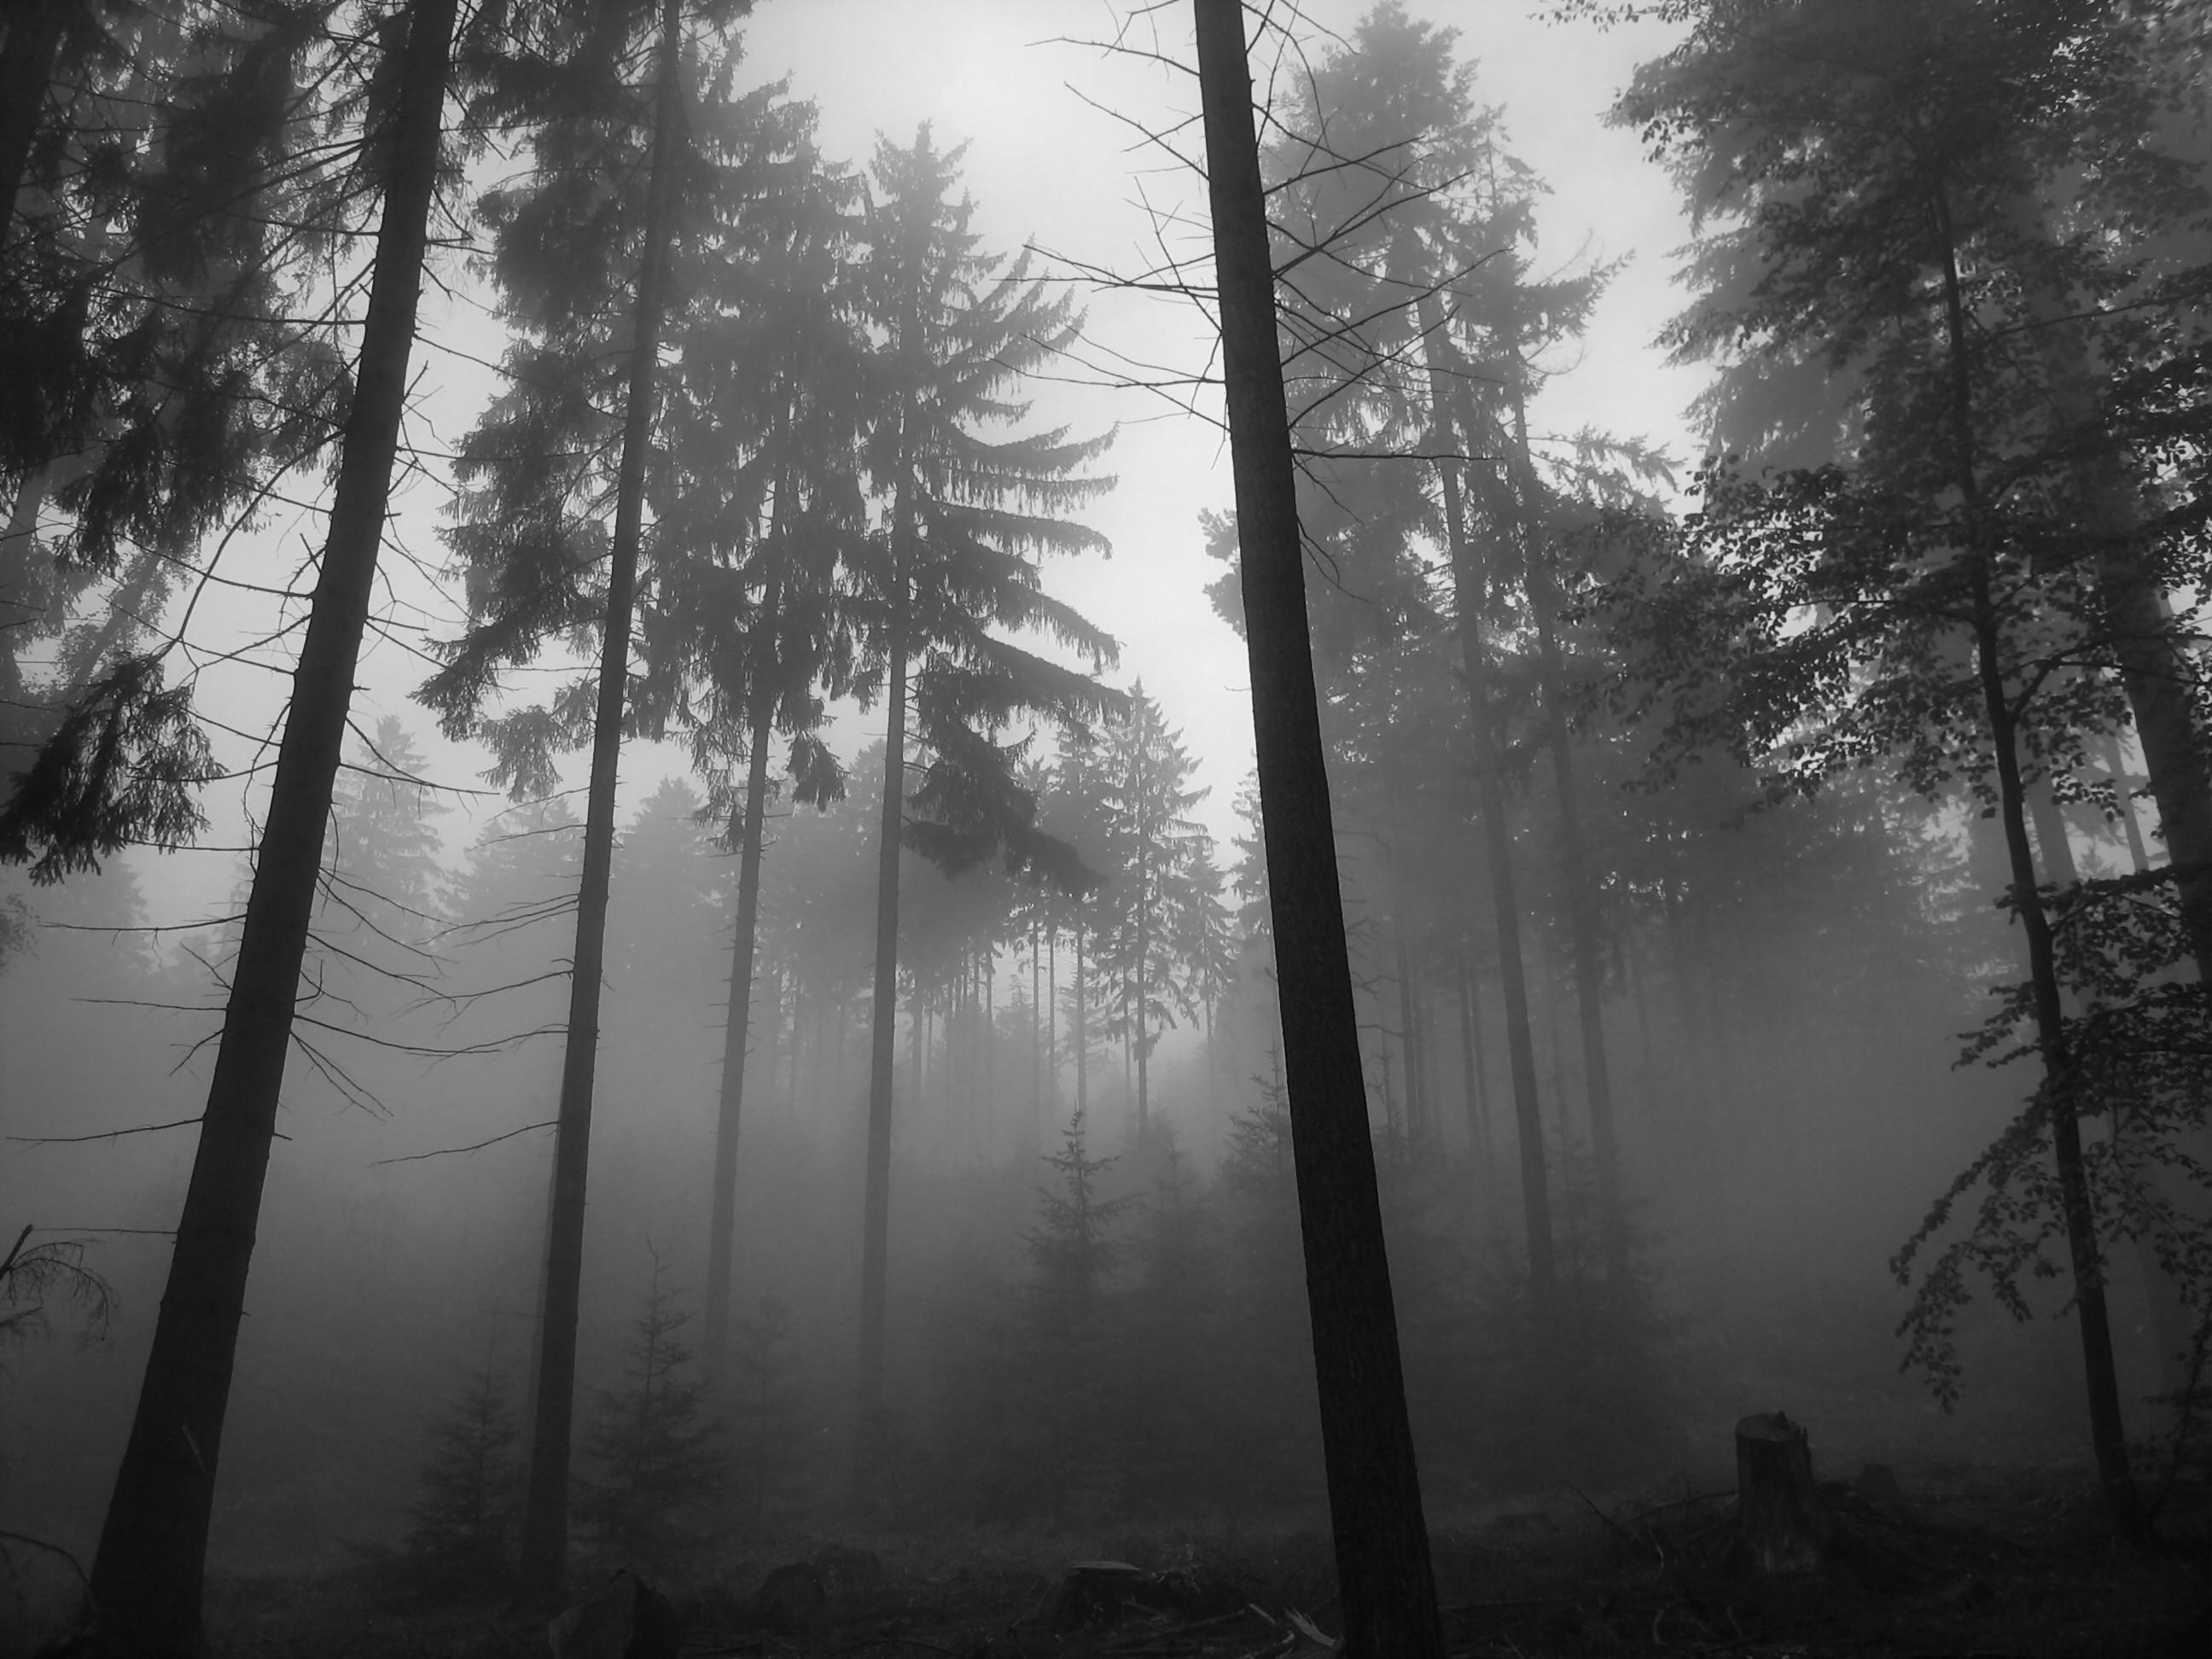 dark night forest wallpaper hd